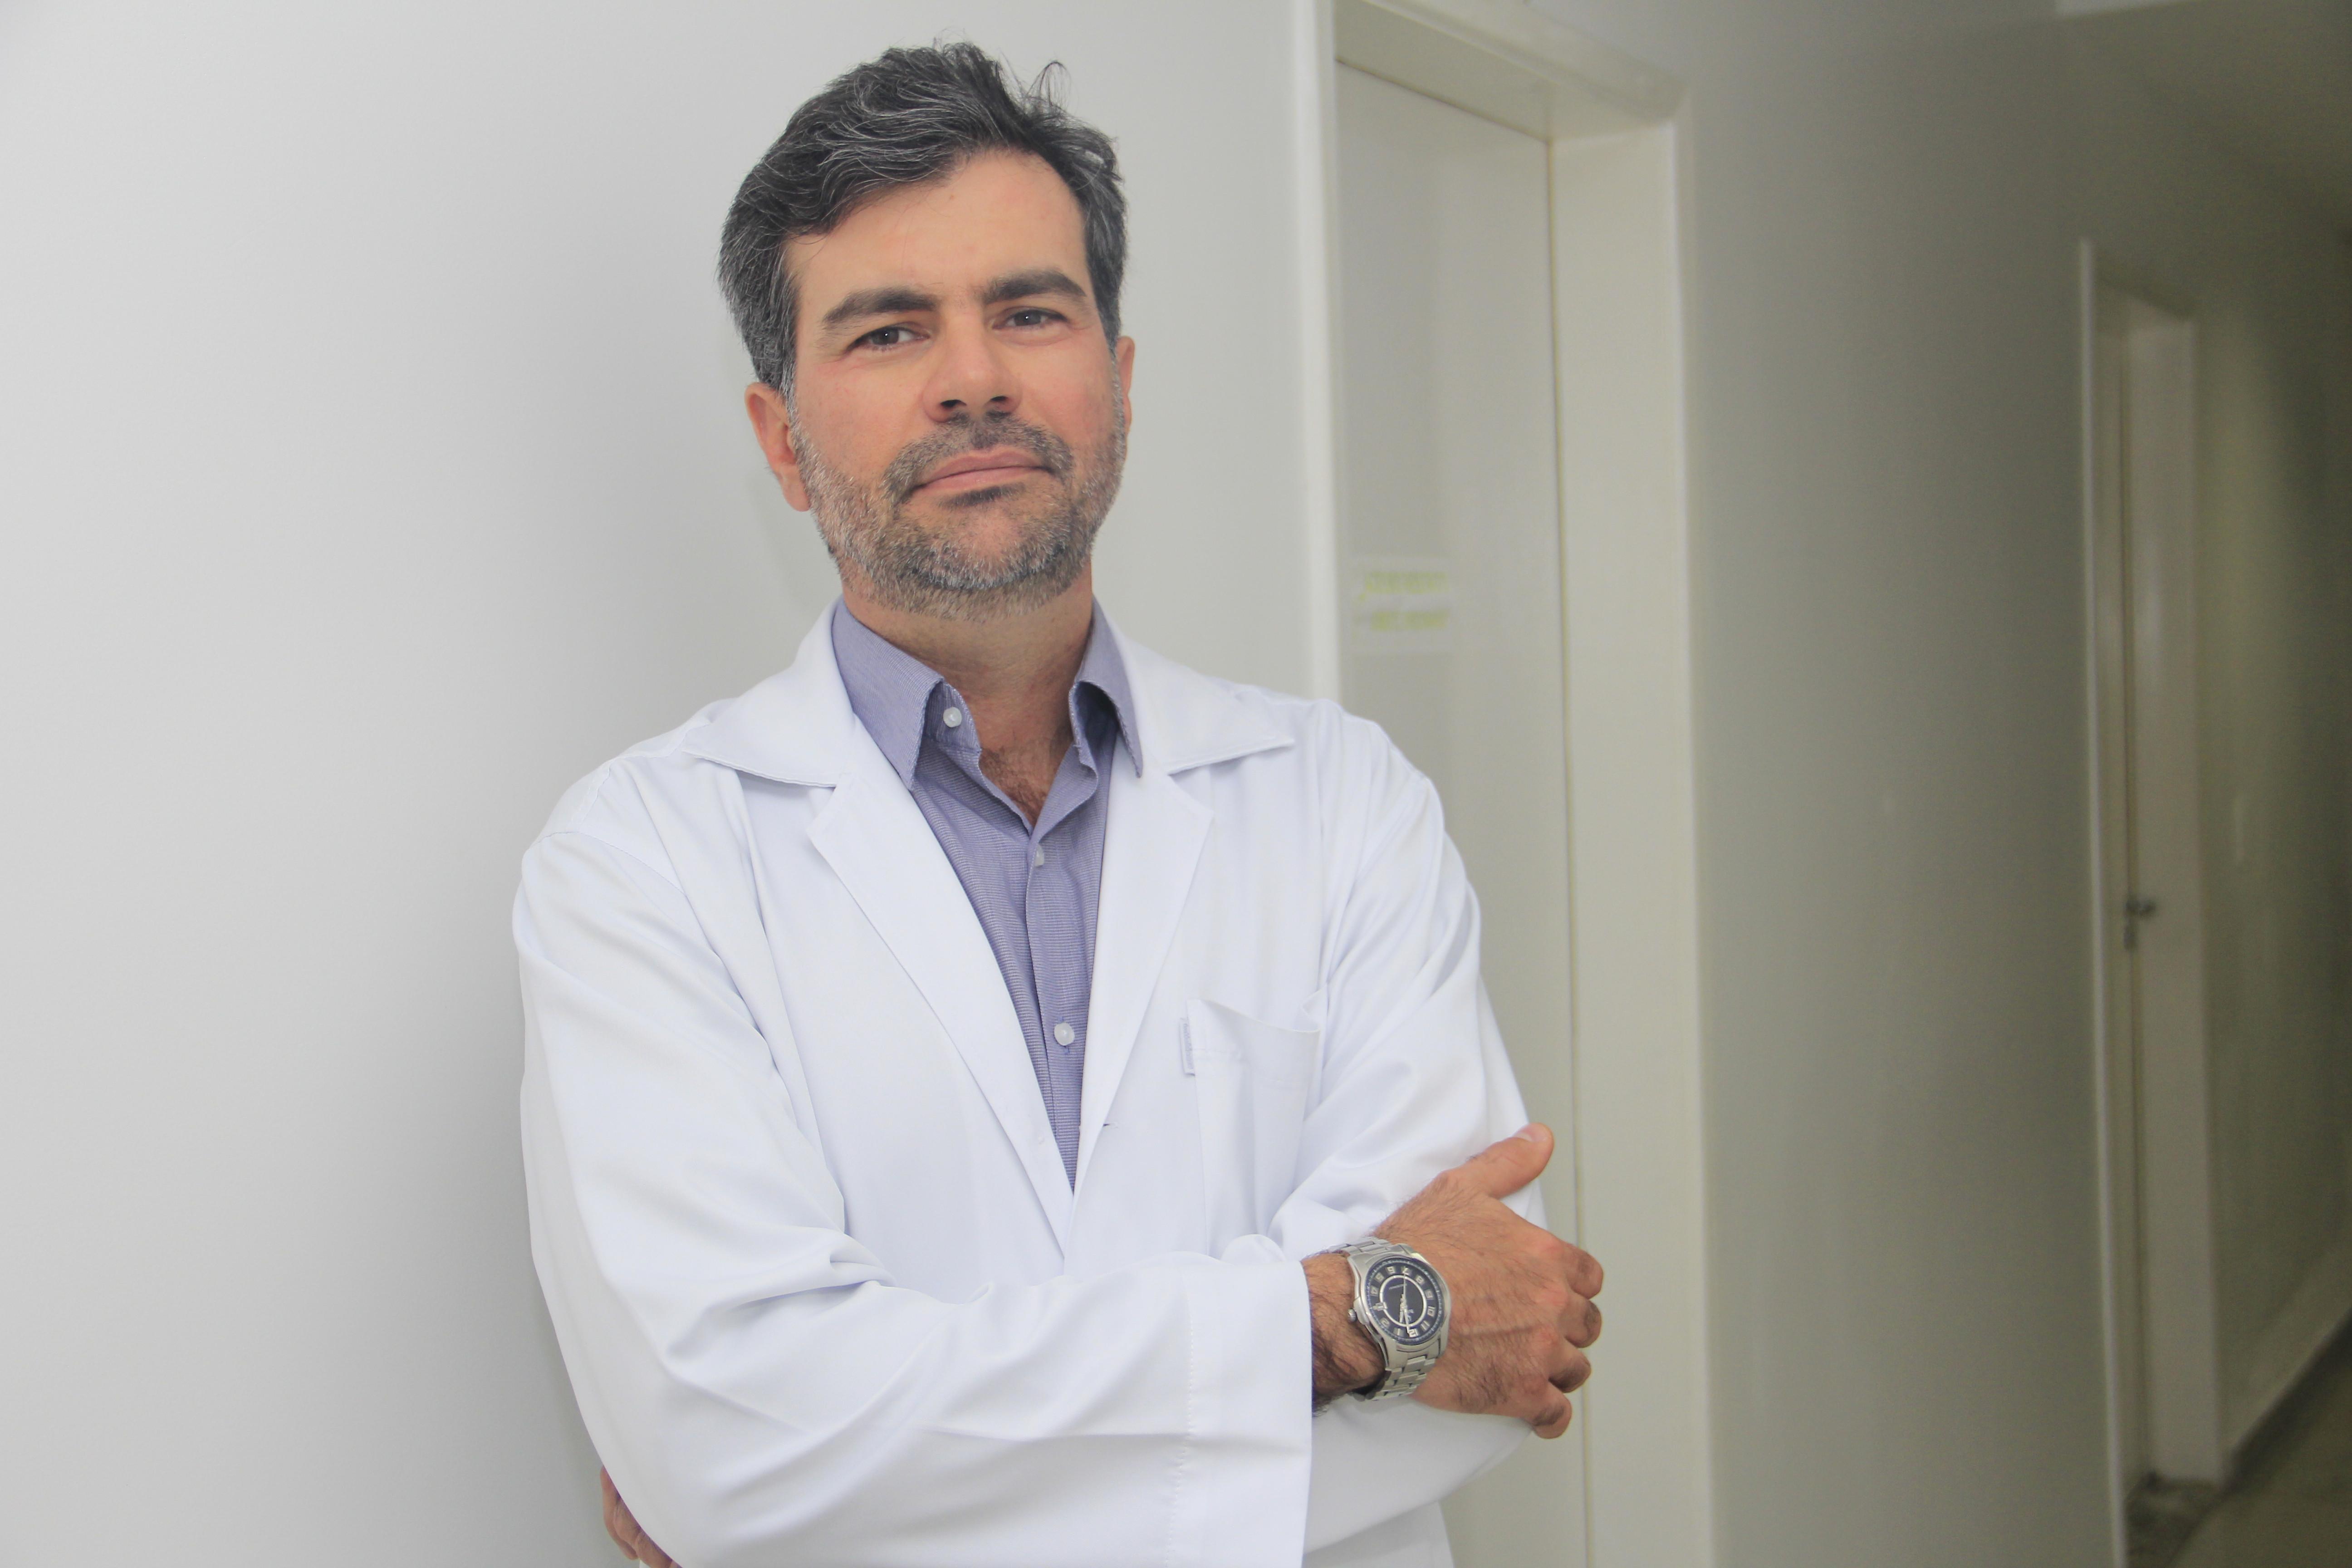 Consulta Dr. Theodorico Fernandes